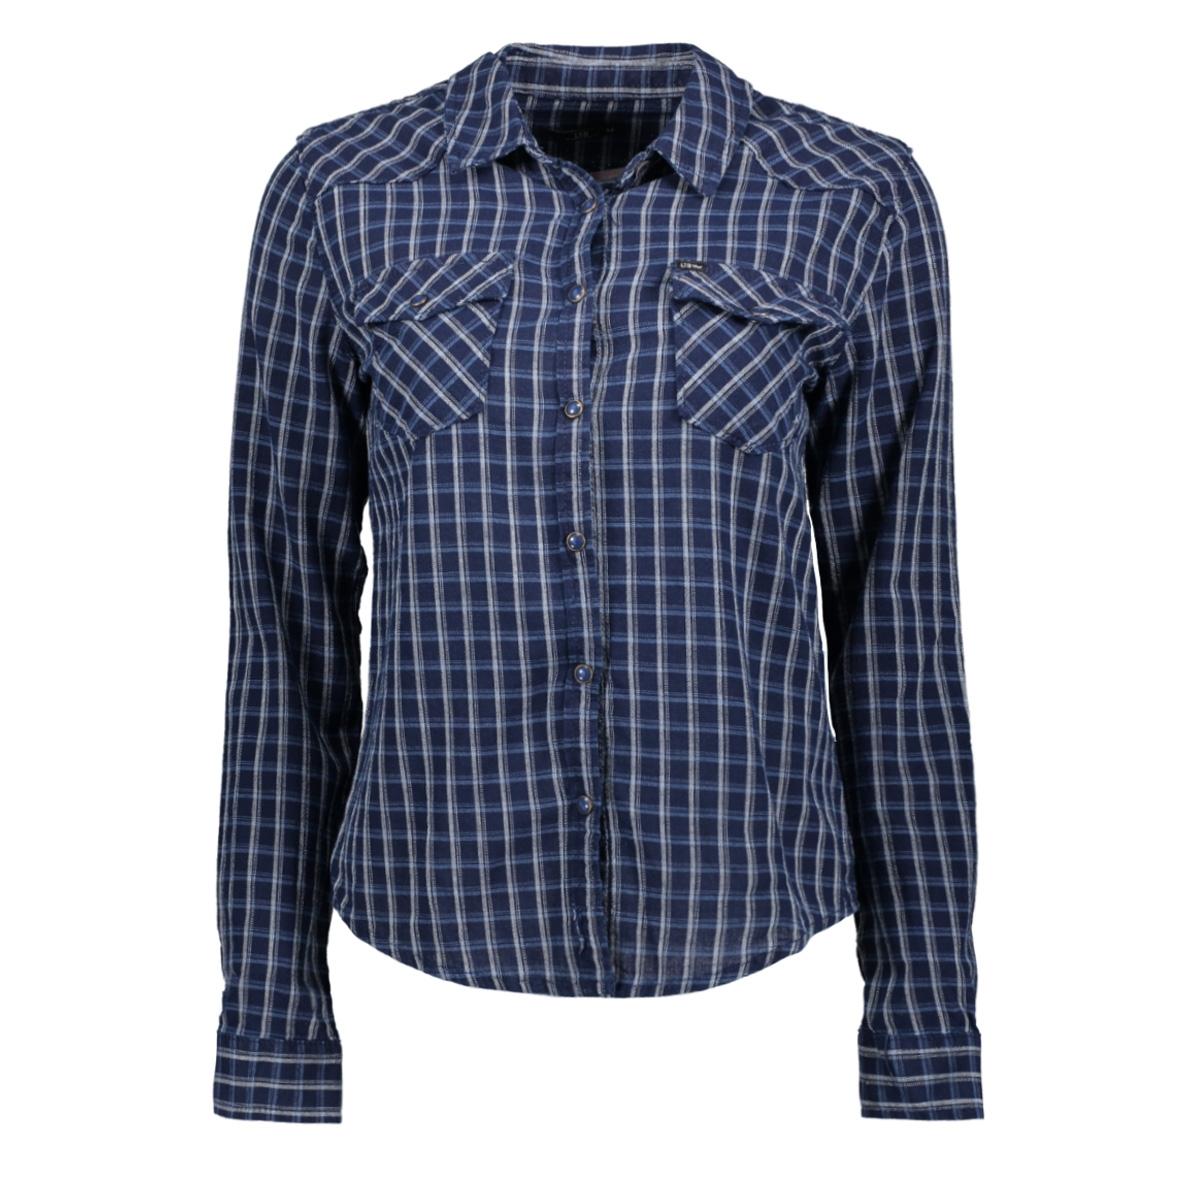 lucinda 10096047414149 ltb blouse indigo sky plaid 51205